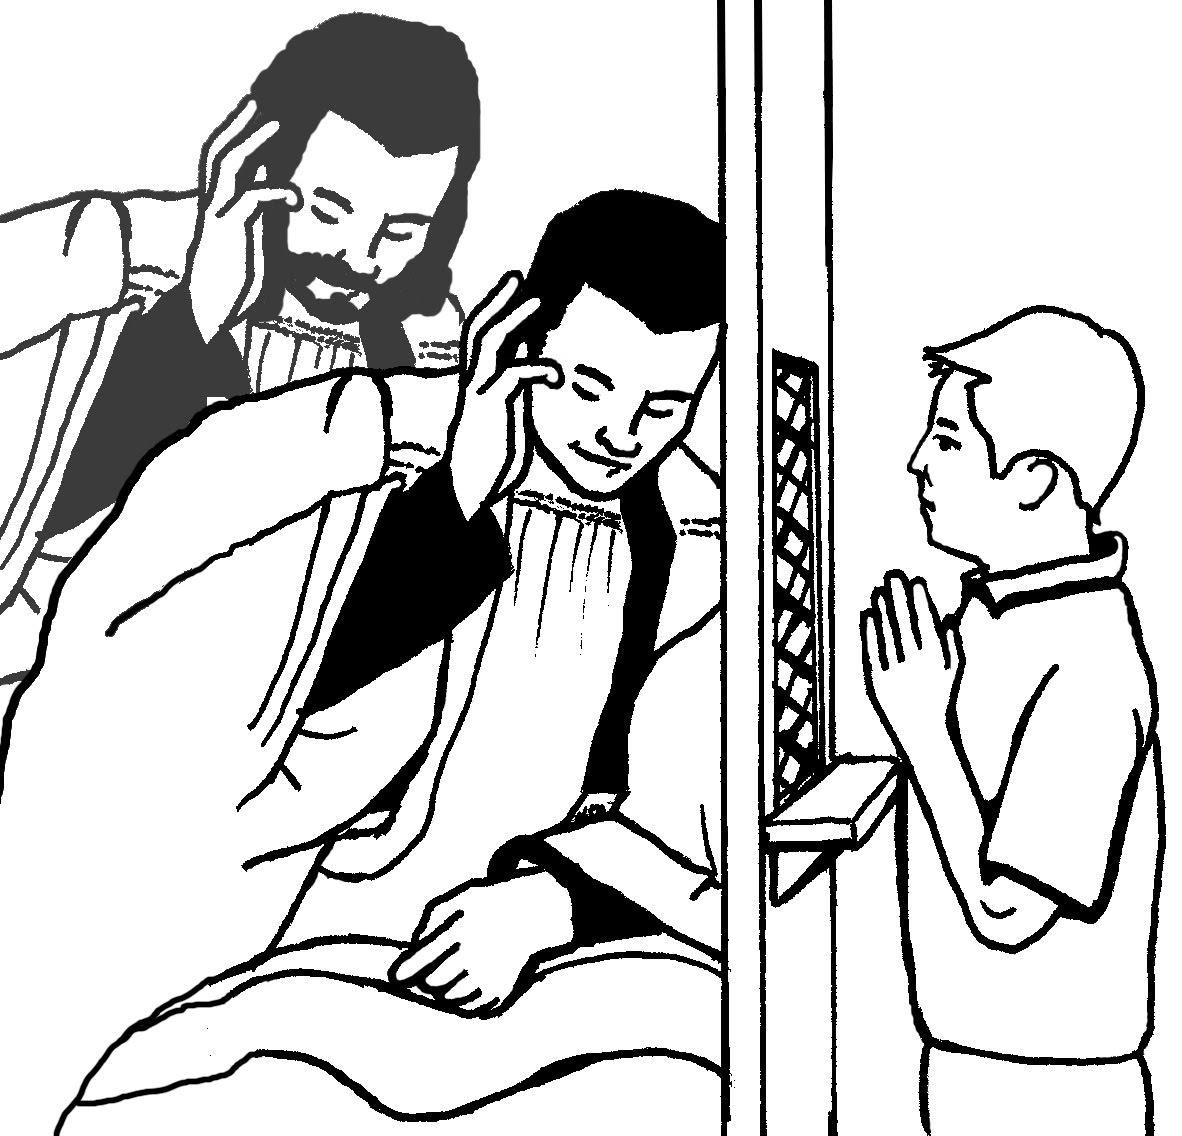 Free Confession Cliparts, Download Free Clip Art, Free Clip.